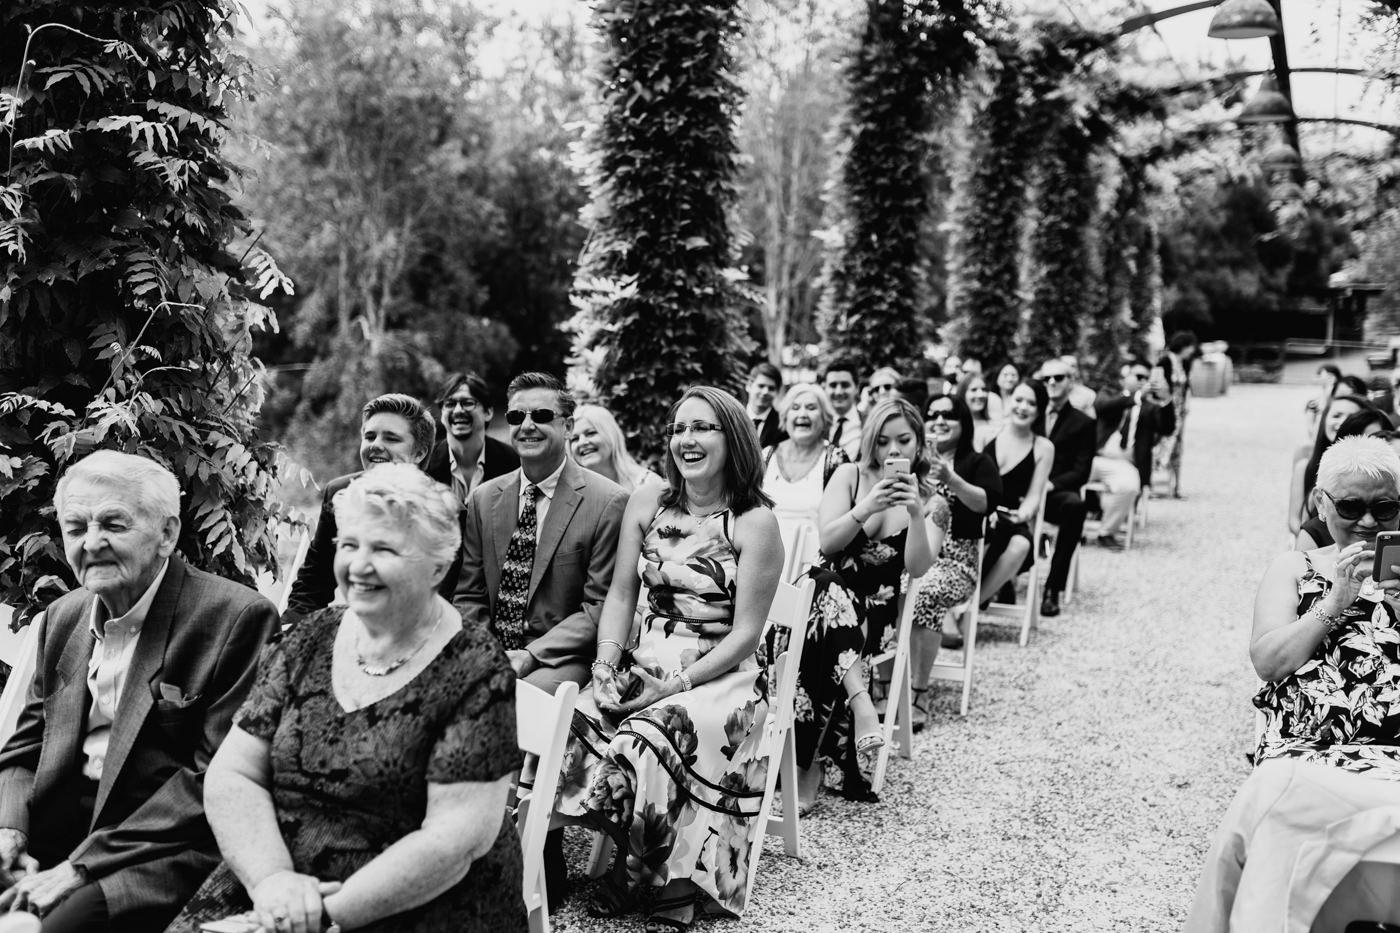 Nick & Vanezza - Fernbank Farm Wedding - Samantha Heather Photography-63.jpg